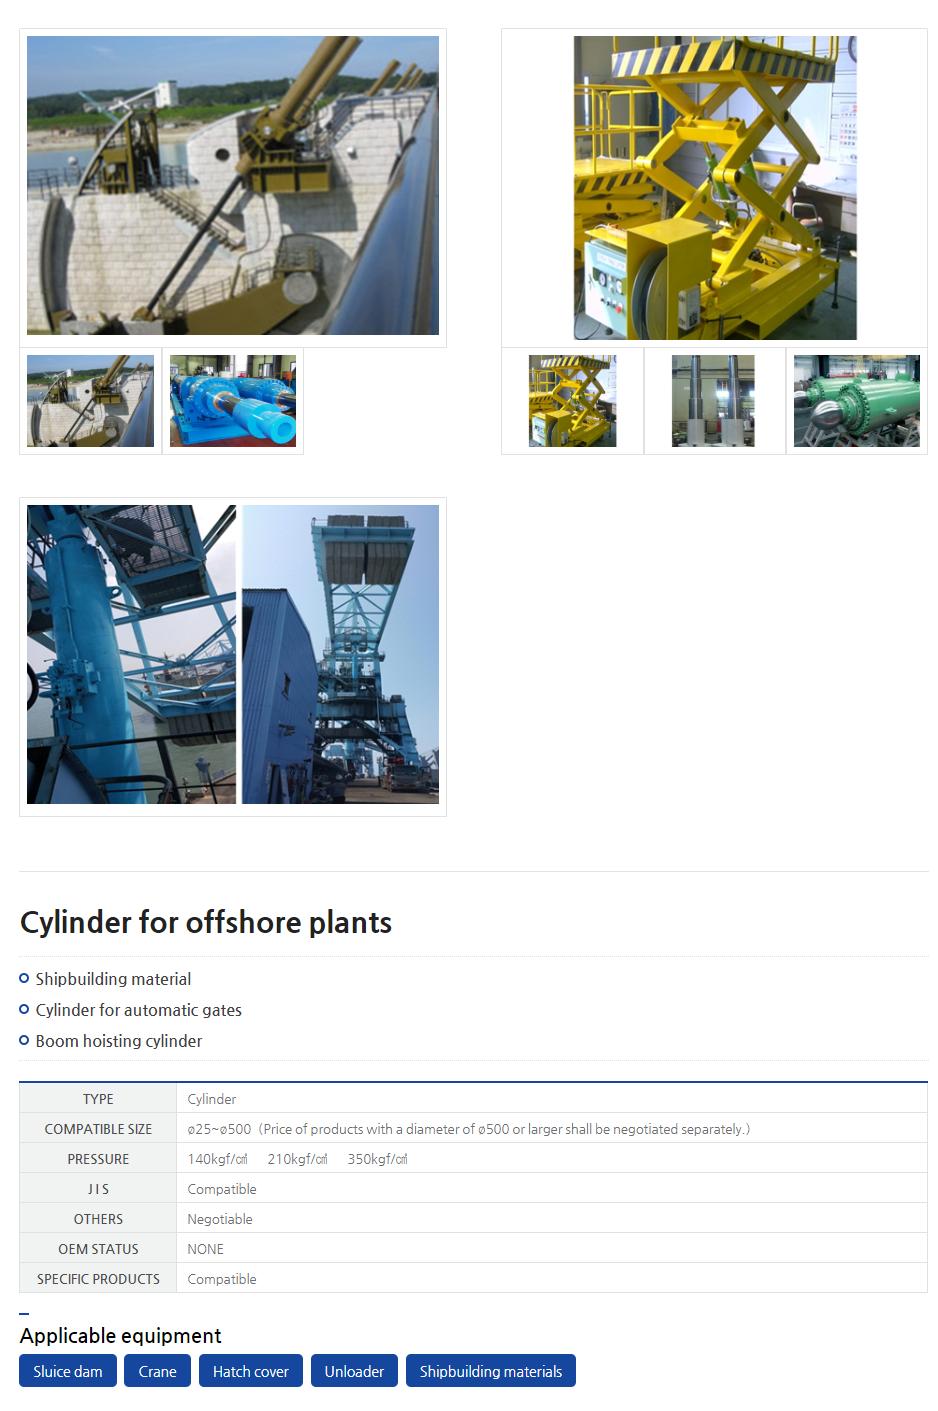 CYSKO Cylinder for offshore plants